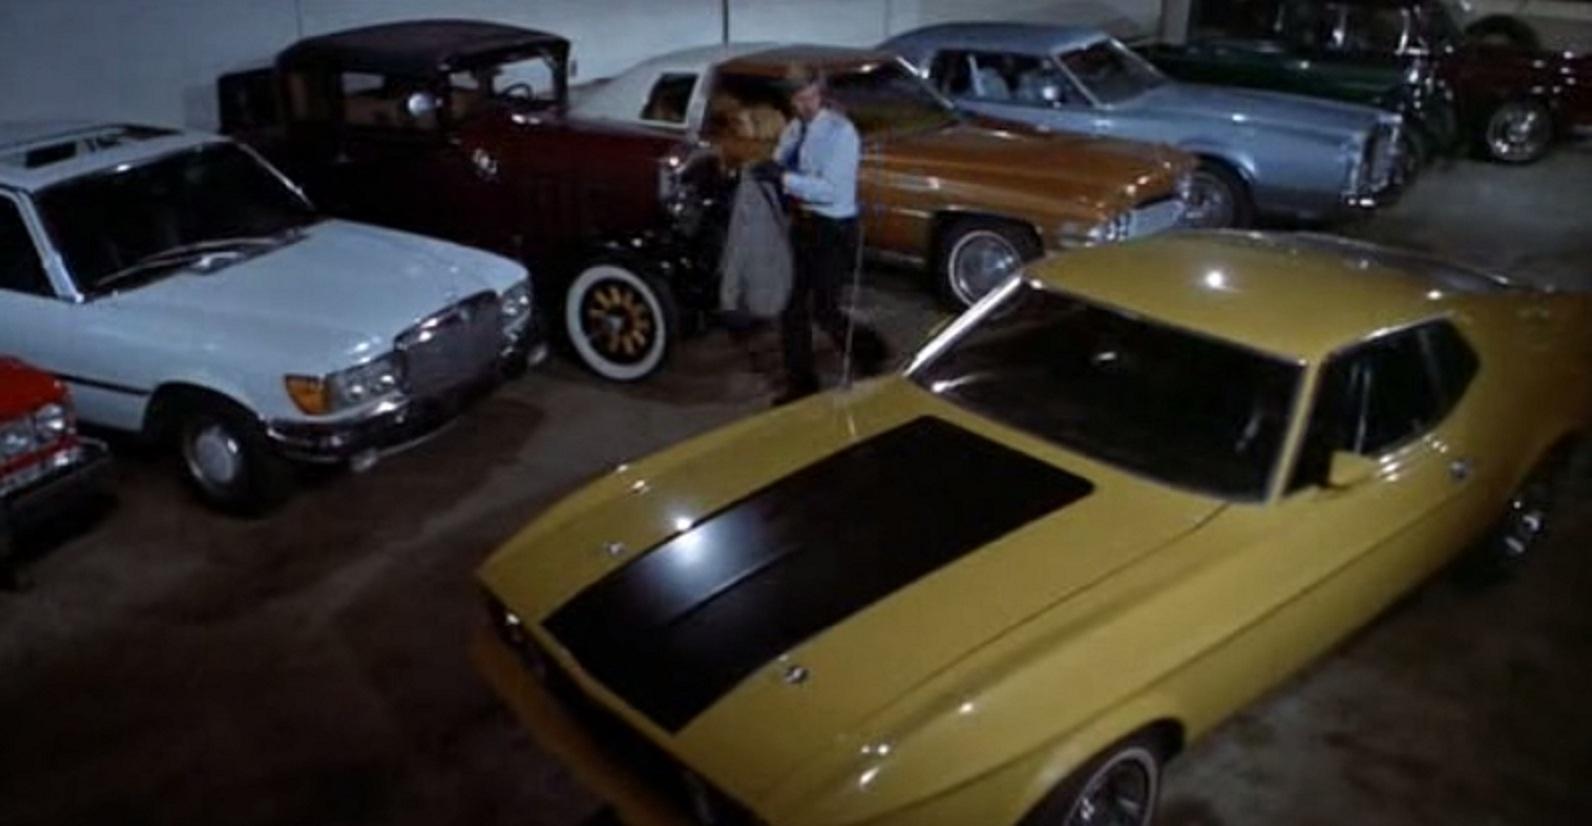 Rollercar - sessanta secondi e via 1974